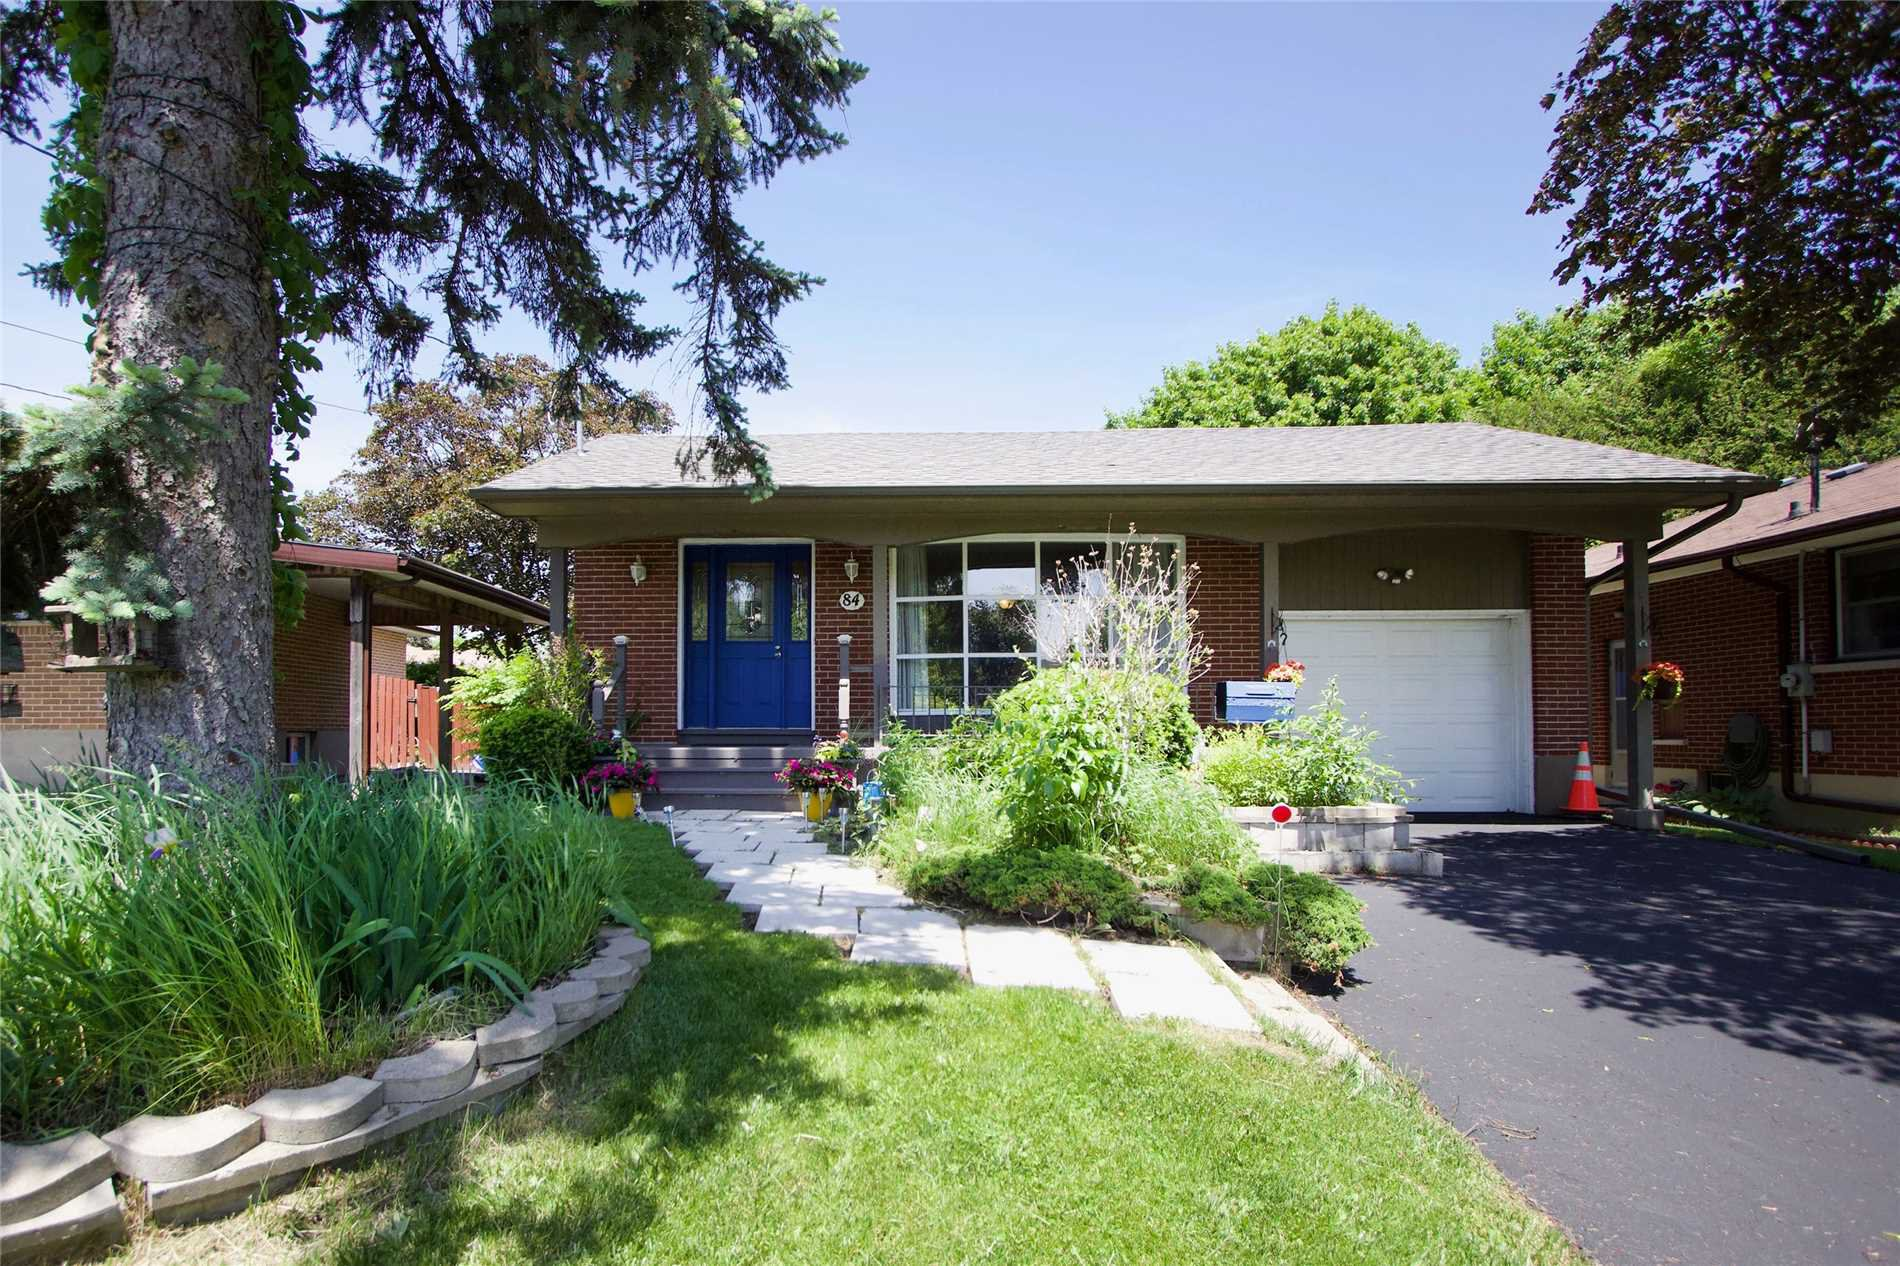 Main Photo: 84 Robert Street in Oshawa: Centennial House (Bungalow) for sale : MLS®# E4486373